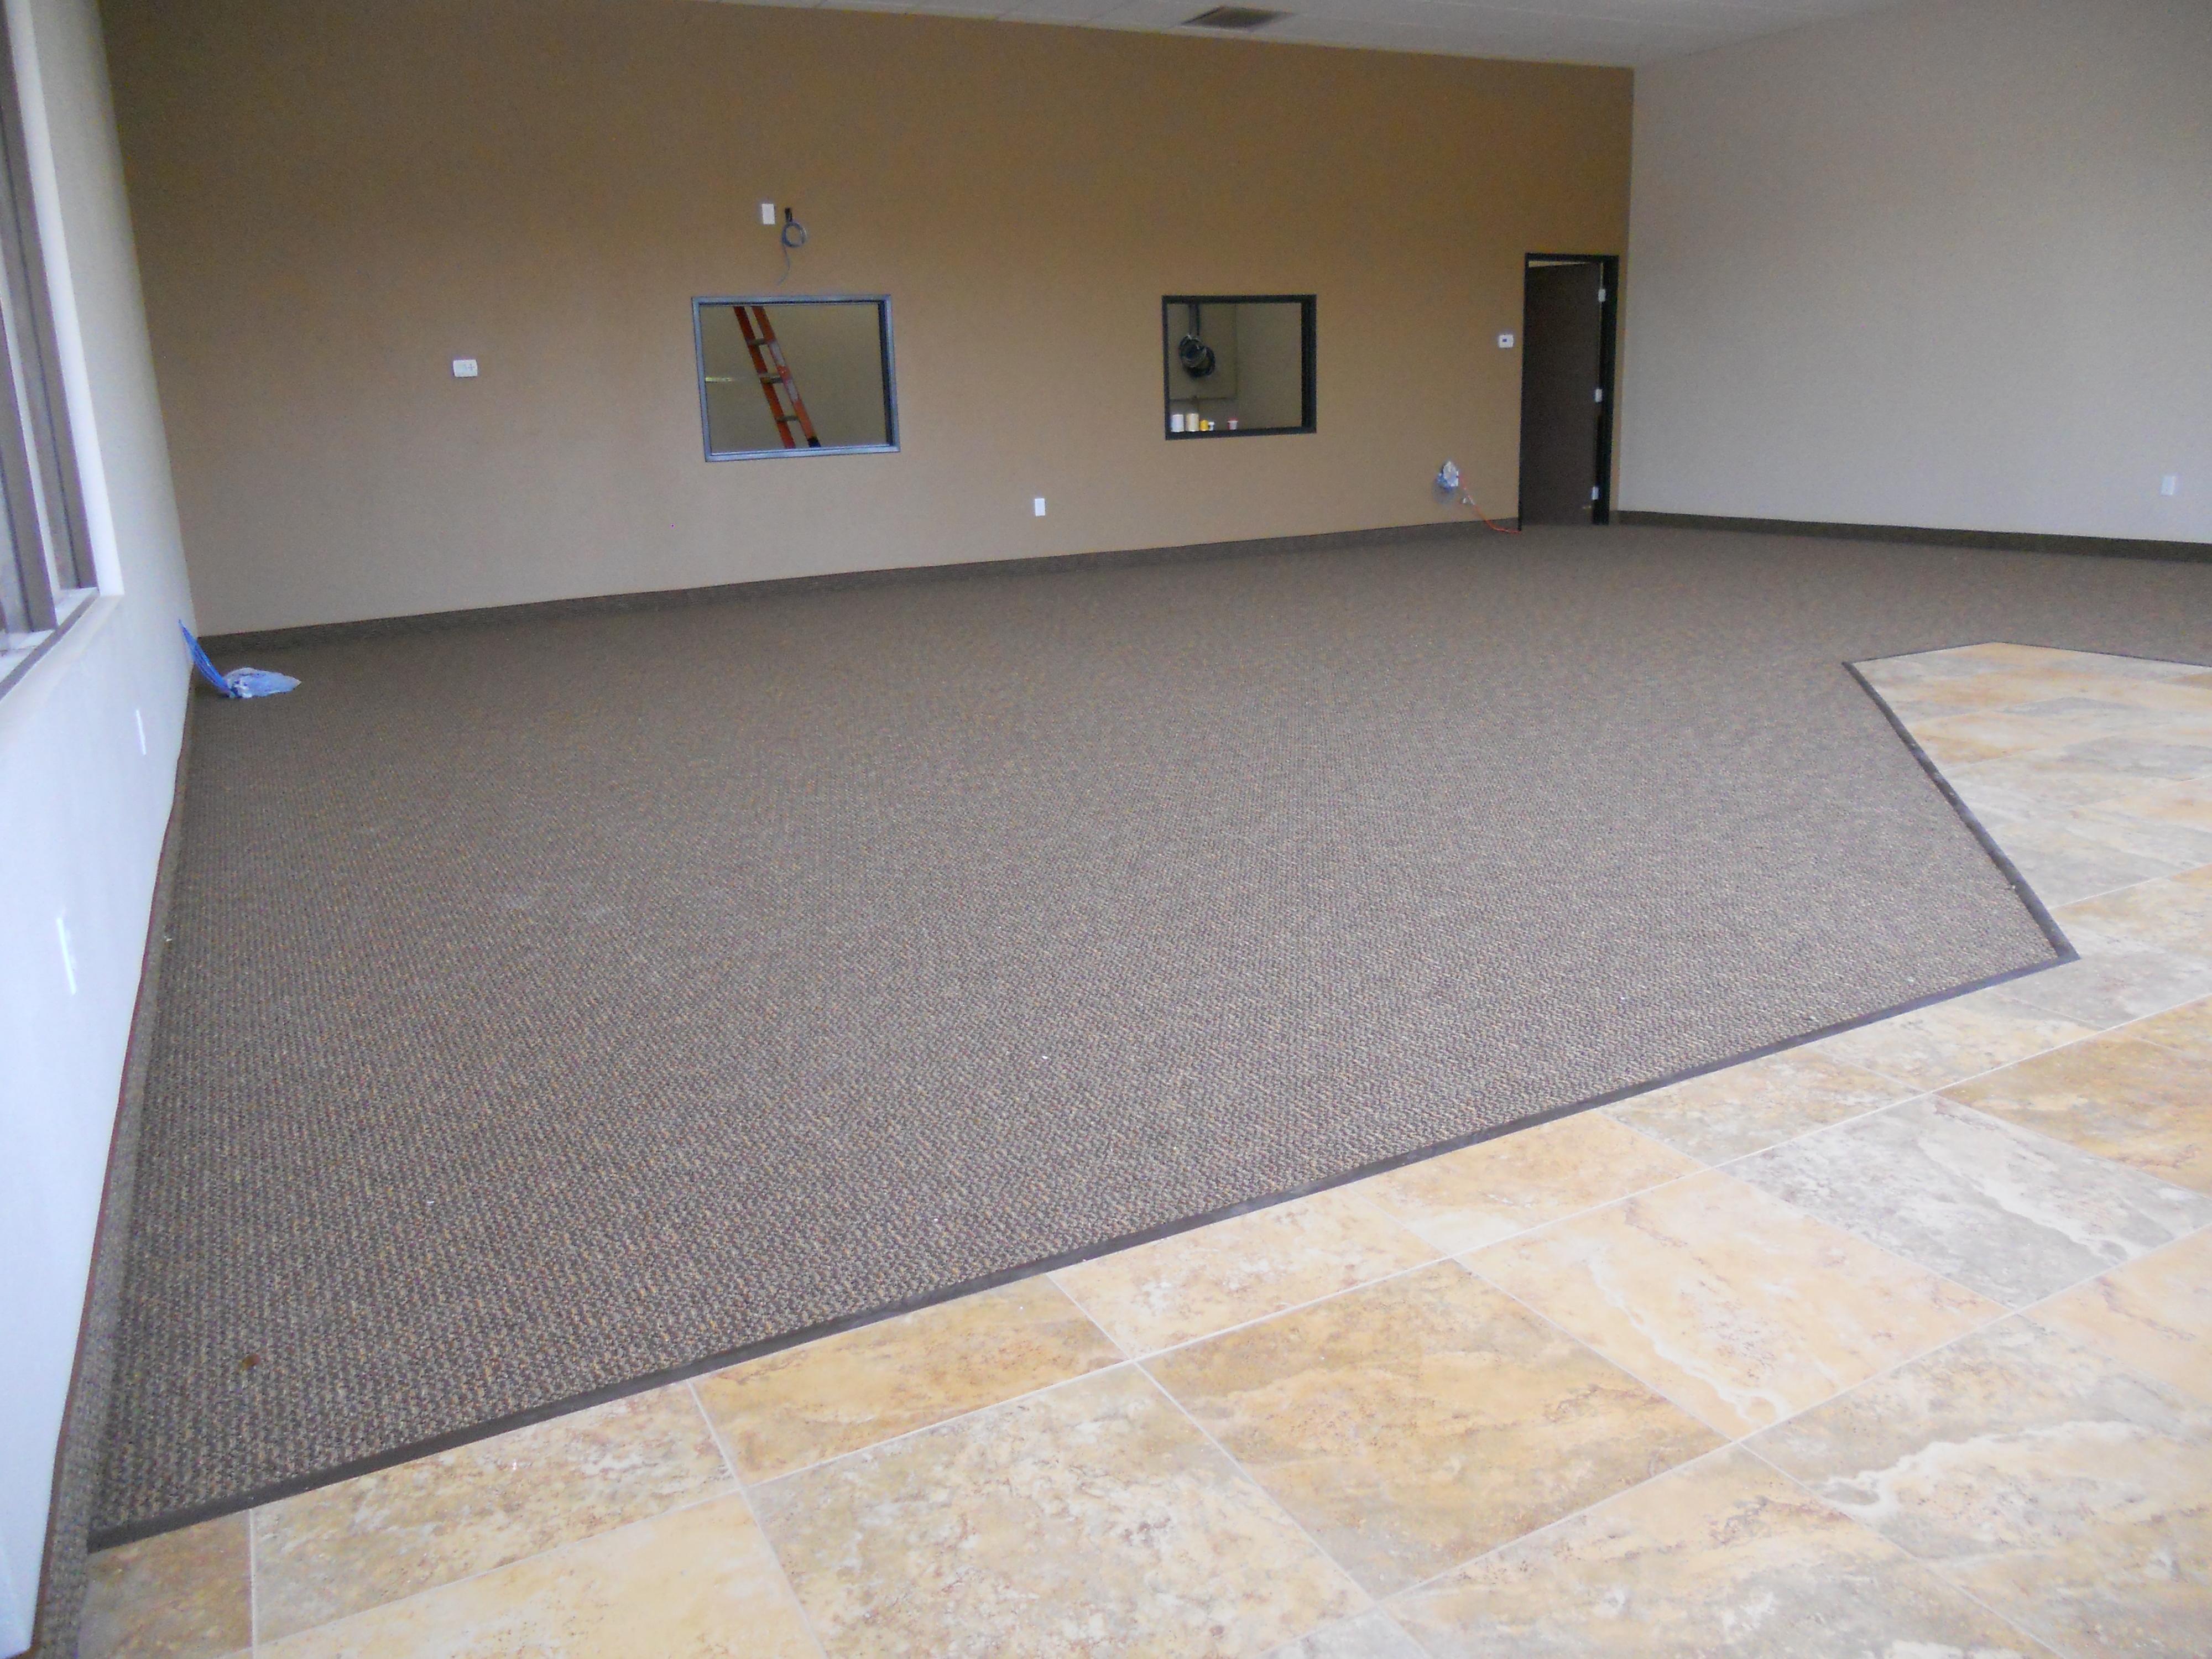 Dura Flooring Inc. - Carpet and Vinyl Installation Image | ProView